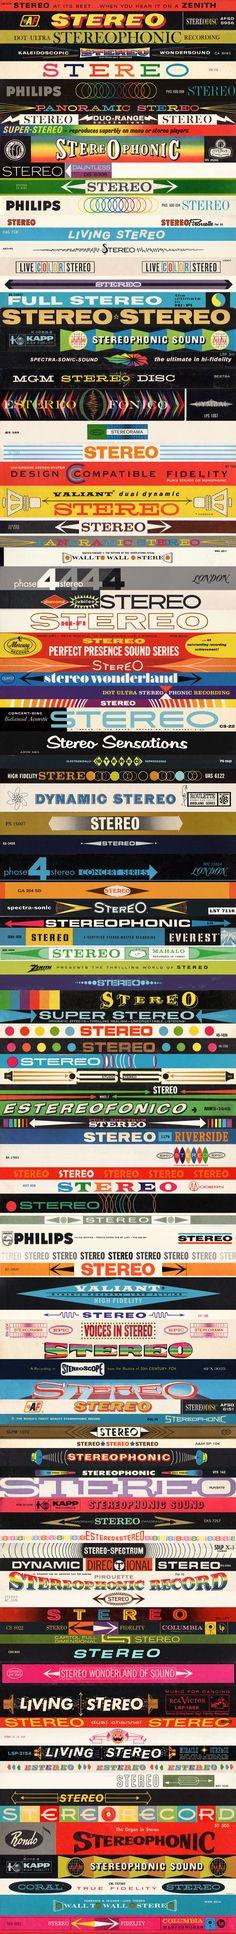 #LP #stereo #banners #vinyl #vinylrecords